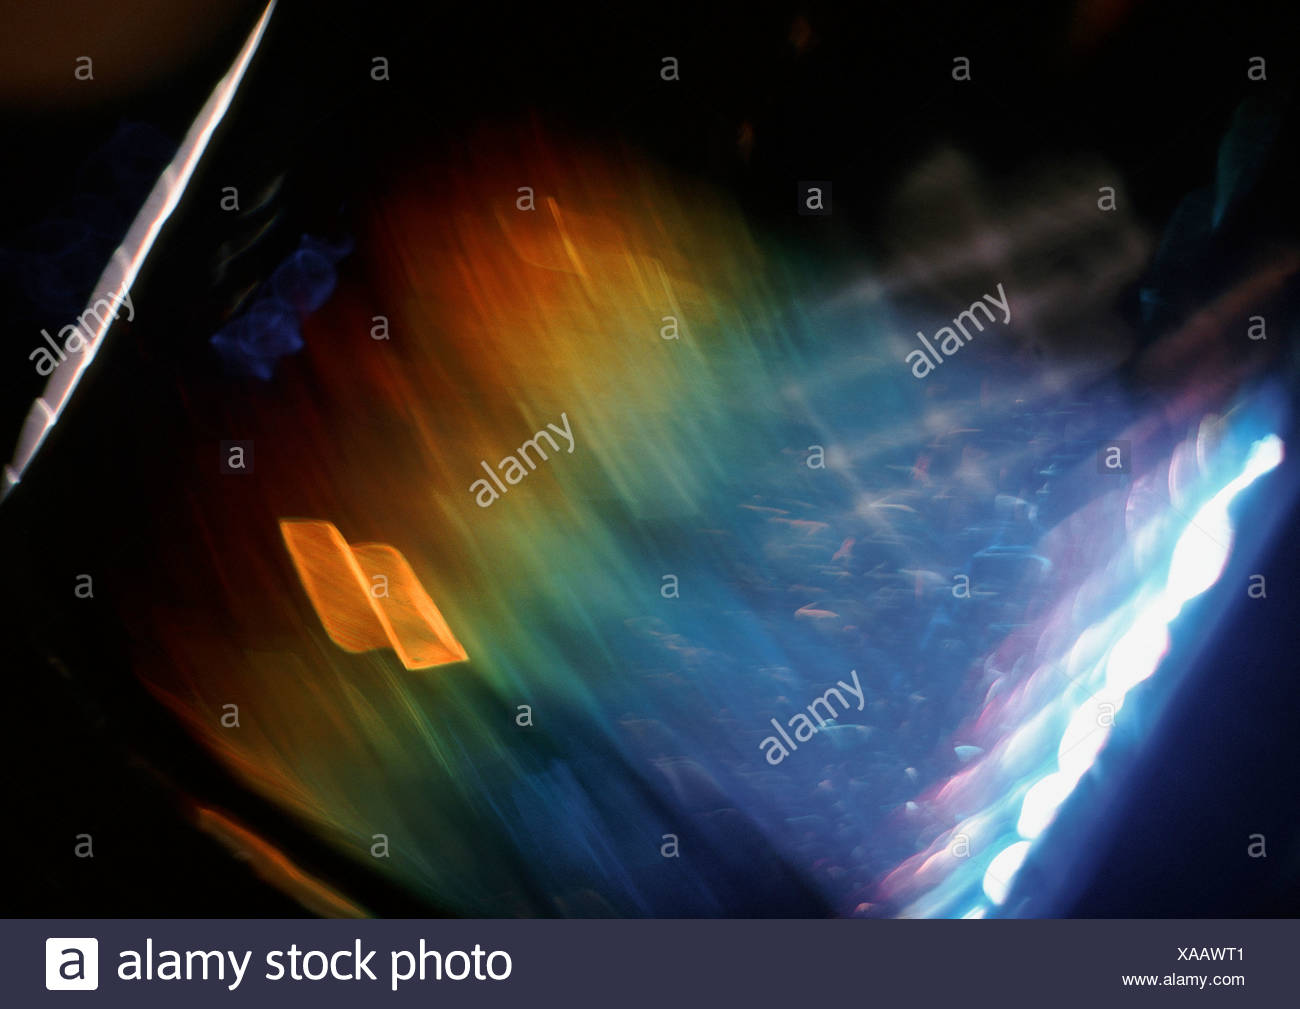 Light effect, rainbow colored - Stock Image